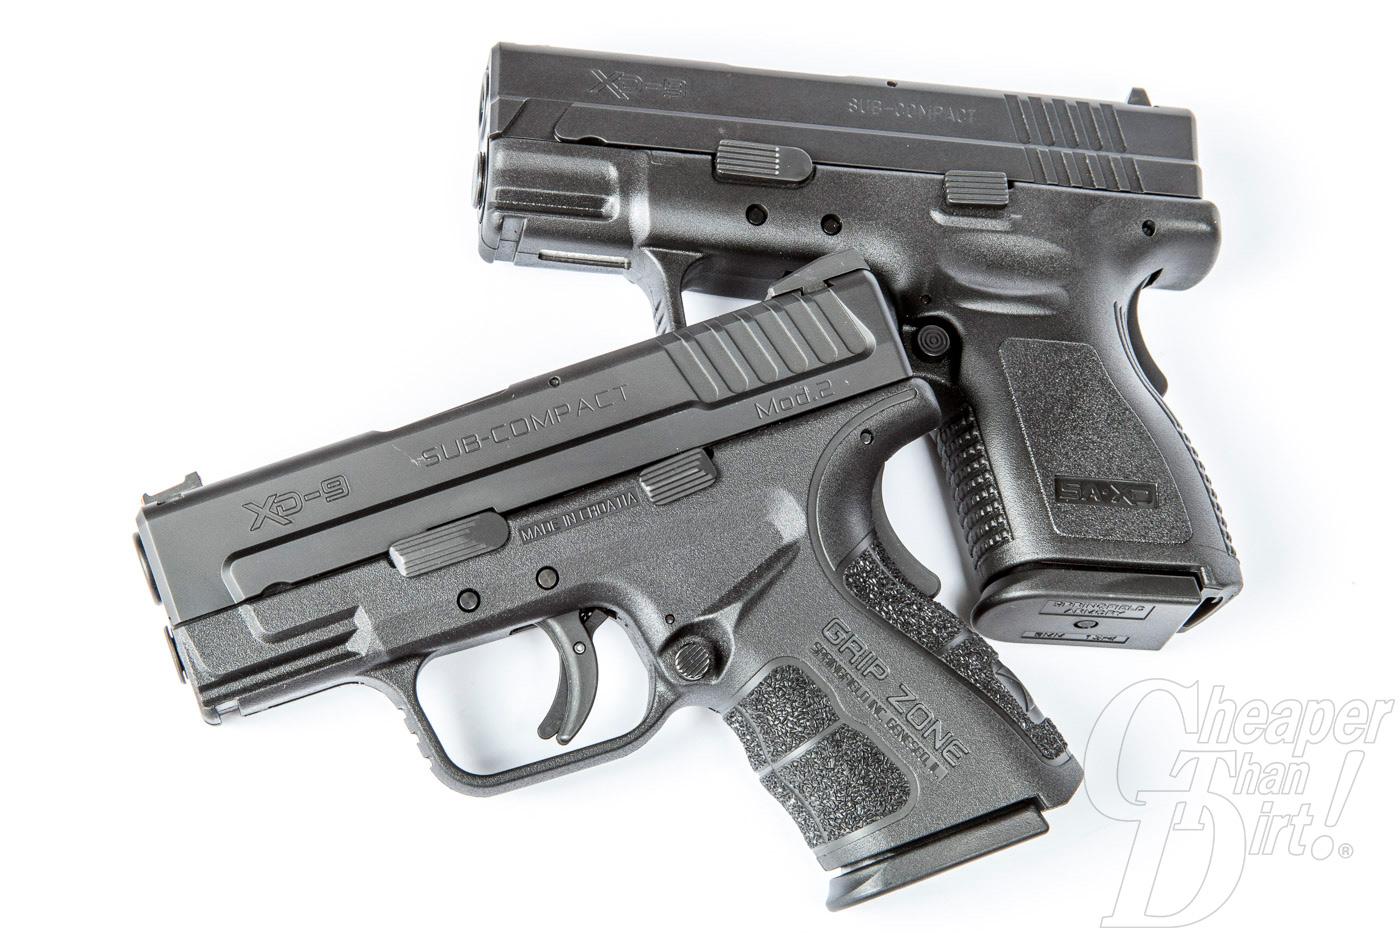 Springfield xd Mod 2 Subcompact 9mm Shot 2015—springfield xd Mod.2